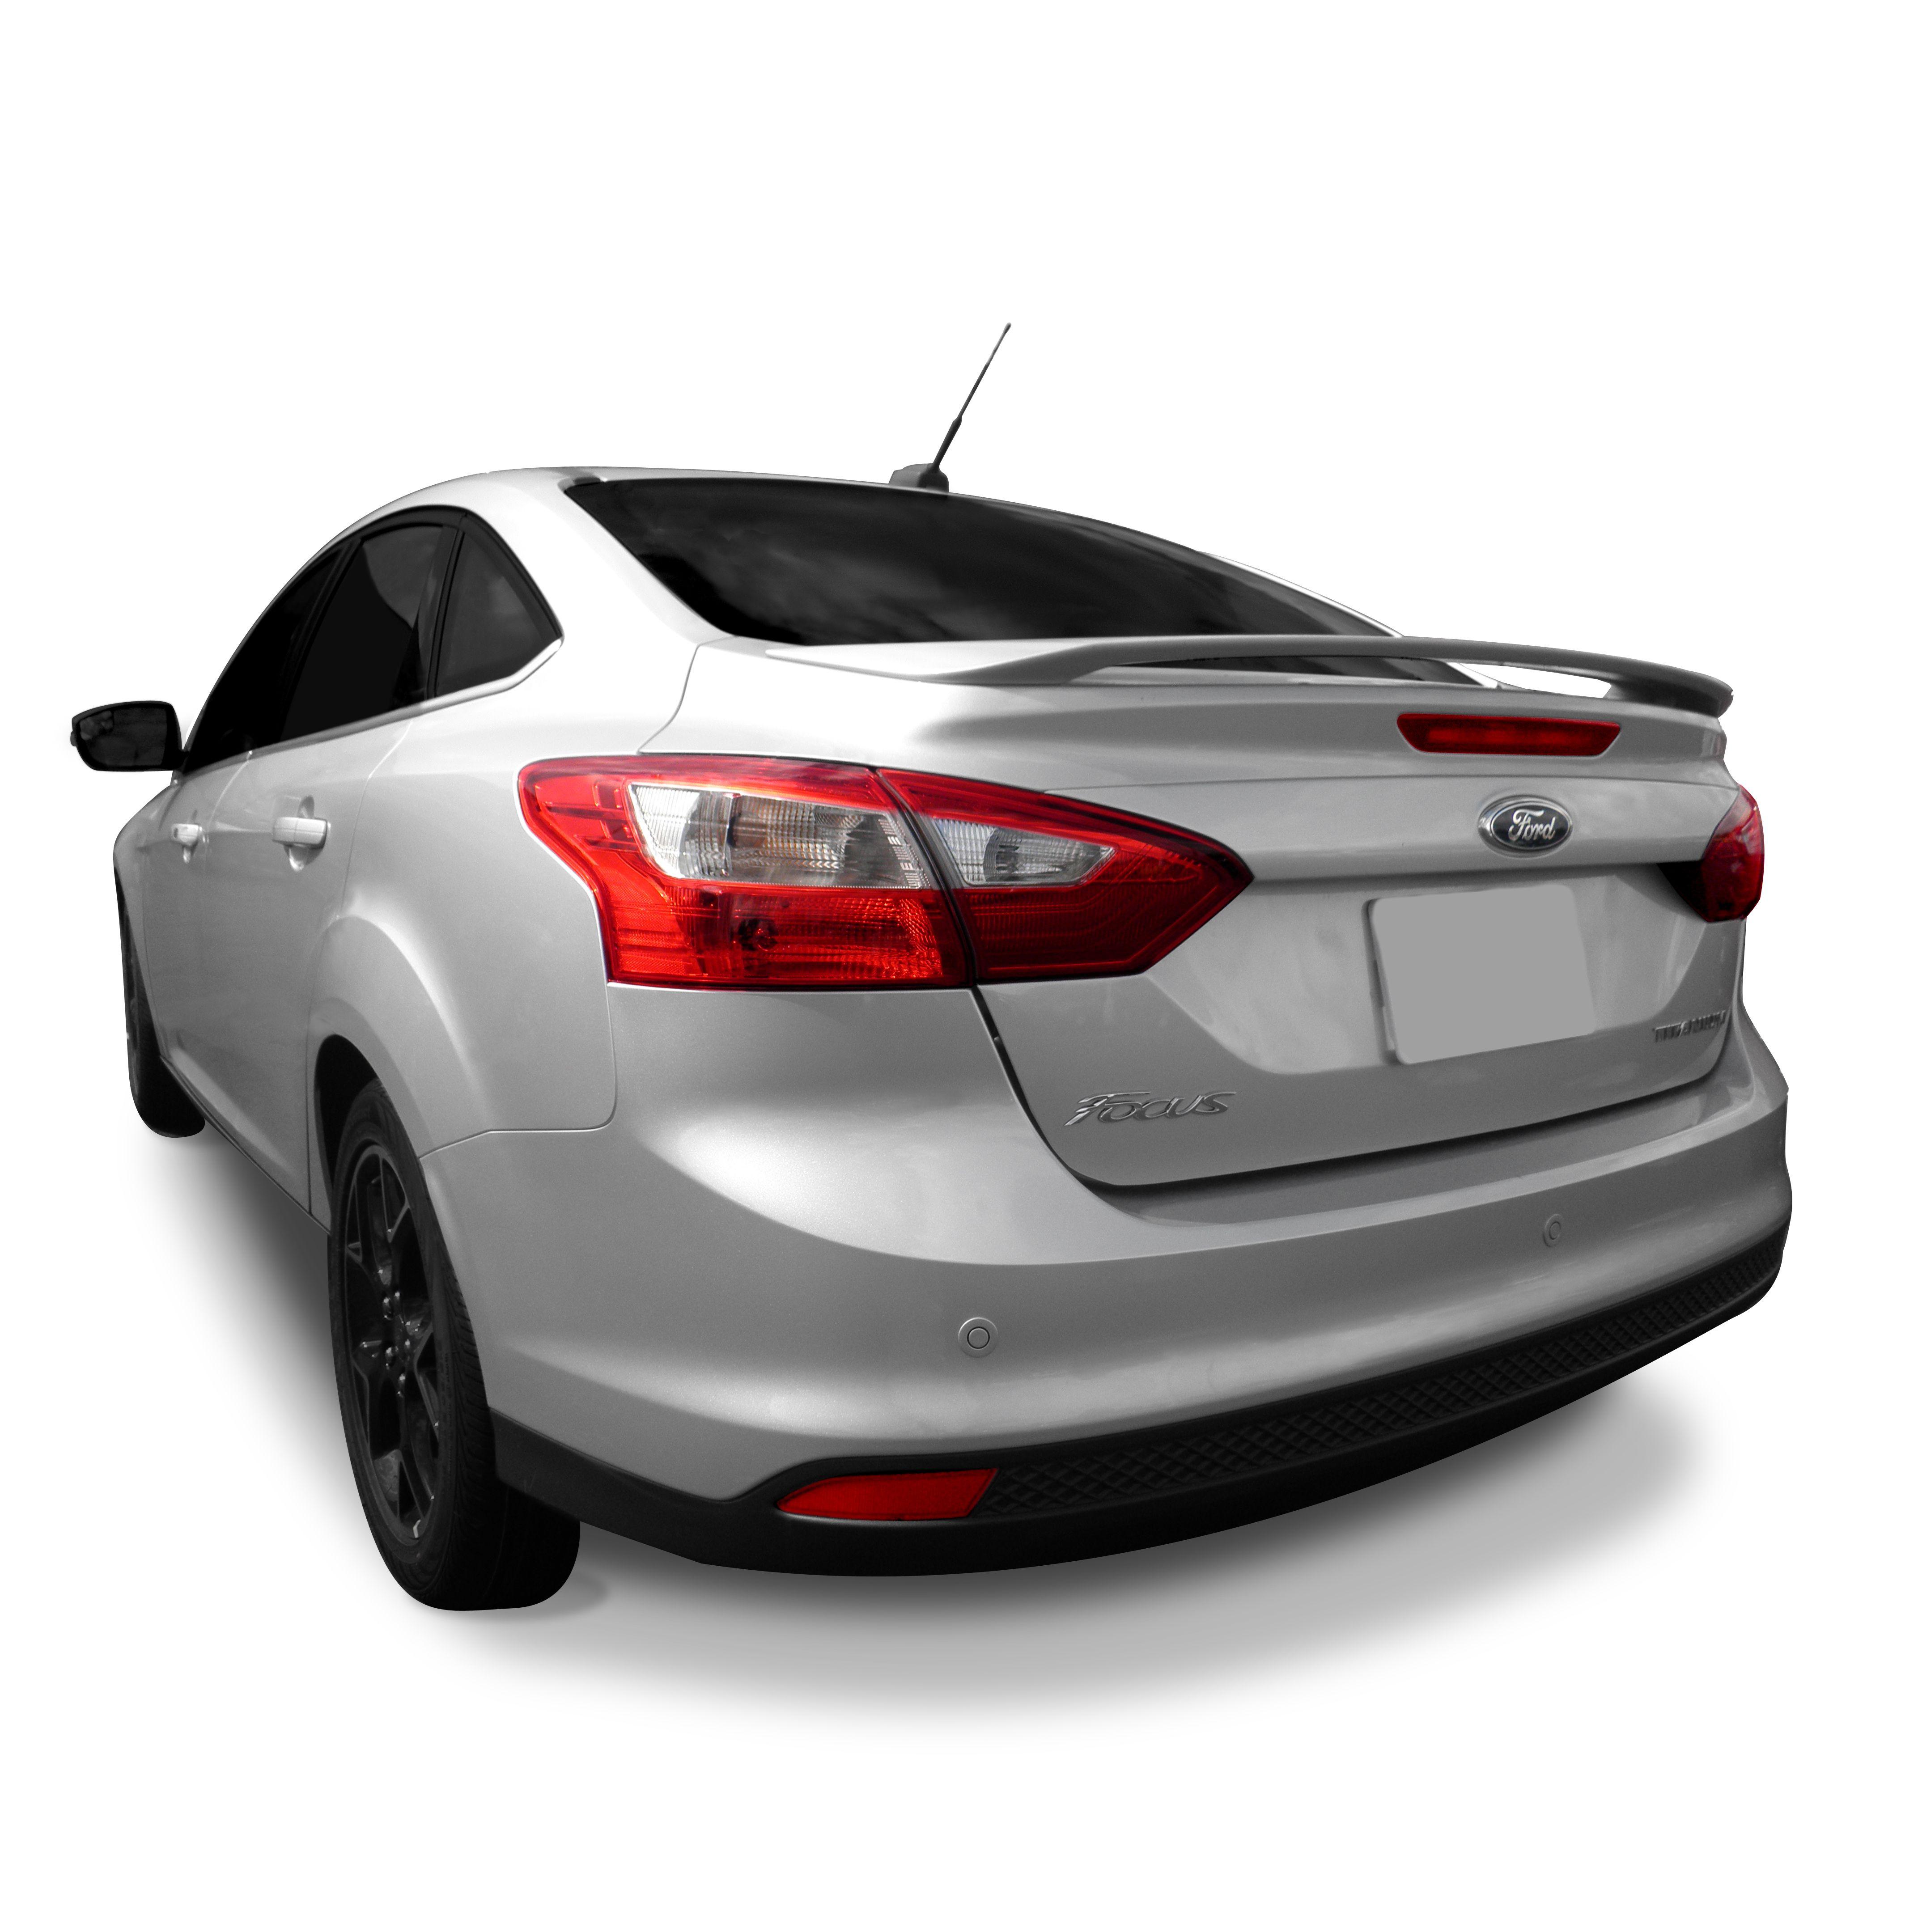 Fordecosport1 0 Ecoboost Titanium 5dr Hatchback: 2014 Ford Focus Sedan Factory Style Pedestal Rear